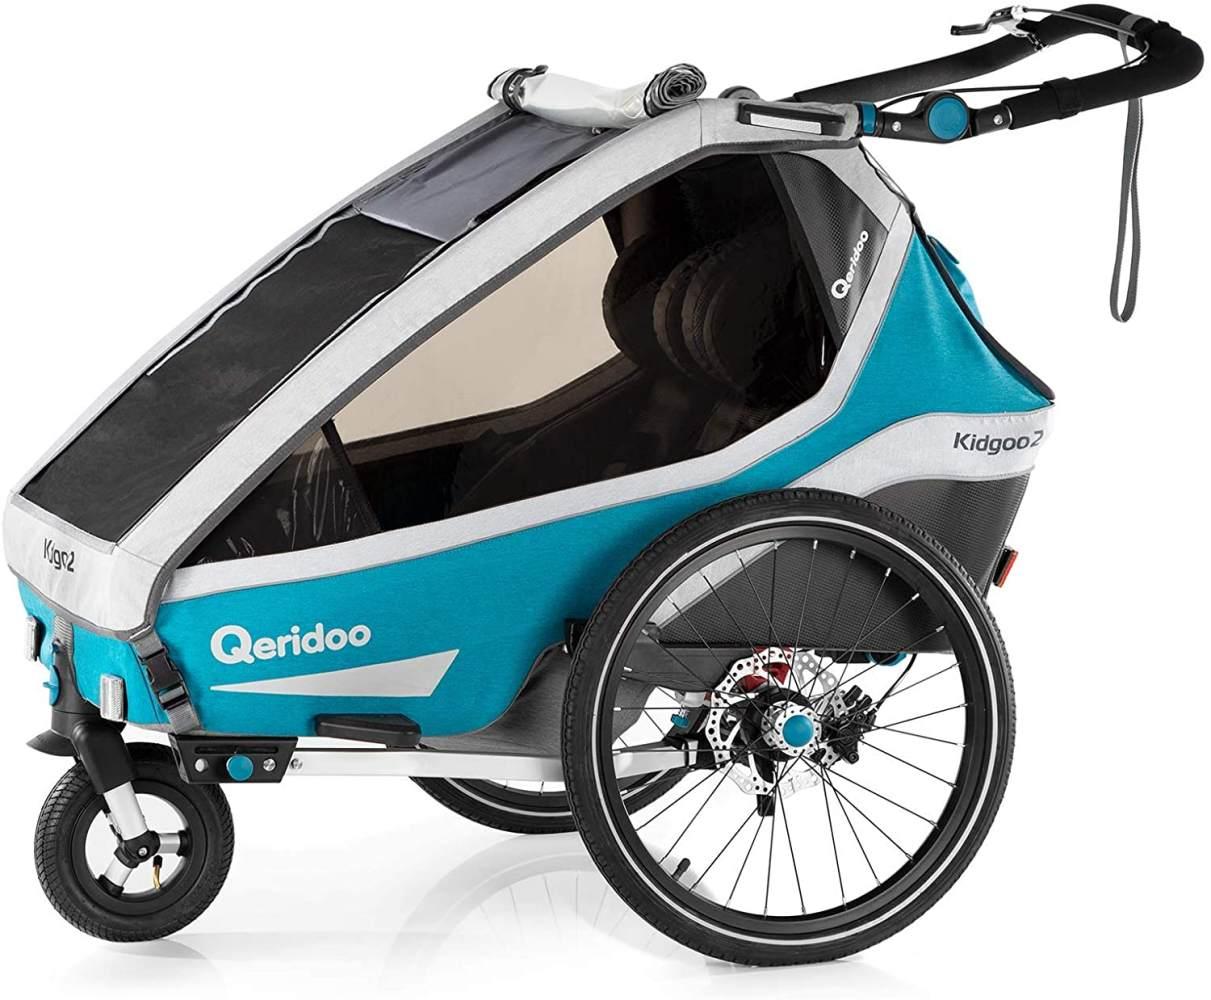 Qeridoo 'Kidgoo2 Sport' Fahrradanhänger 2020, Petrol, 2-Sitzer, inkl. luftgefülltes Buggyrad Bild 1